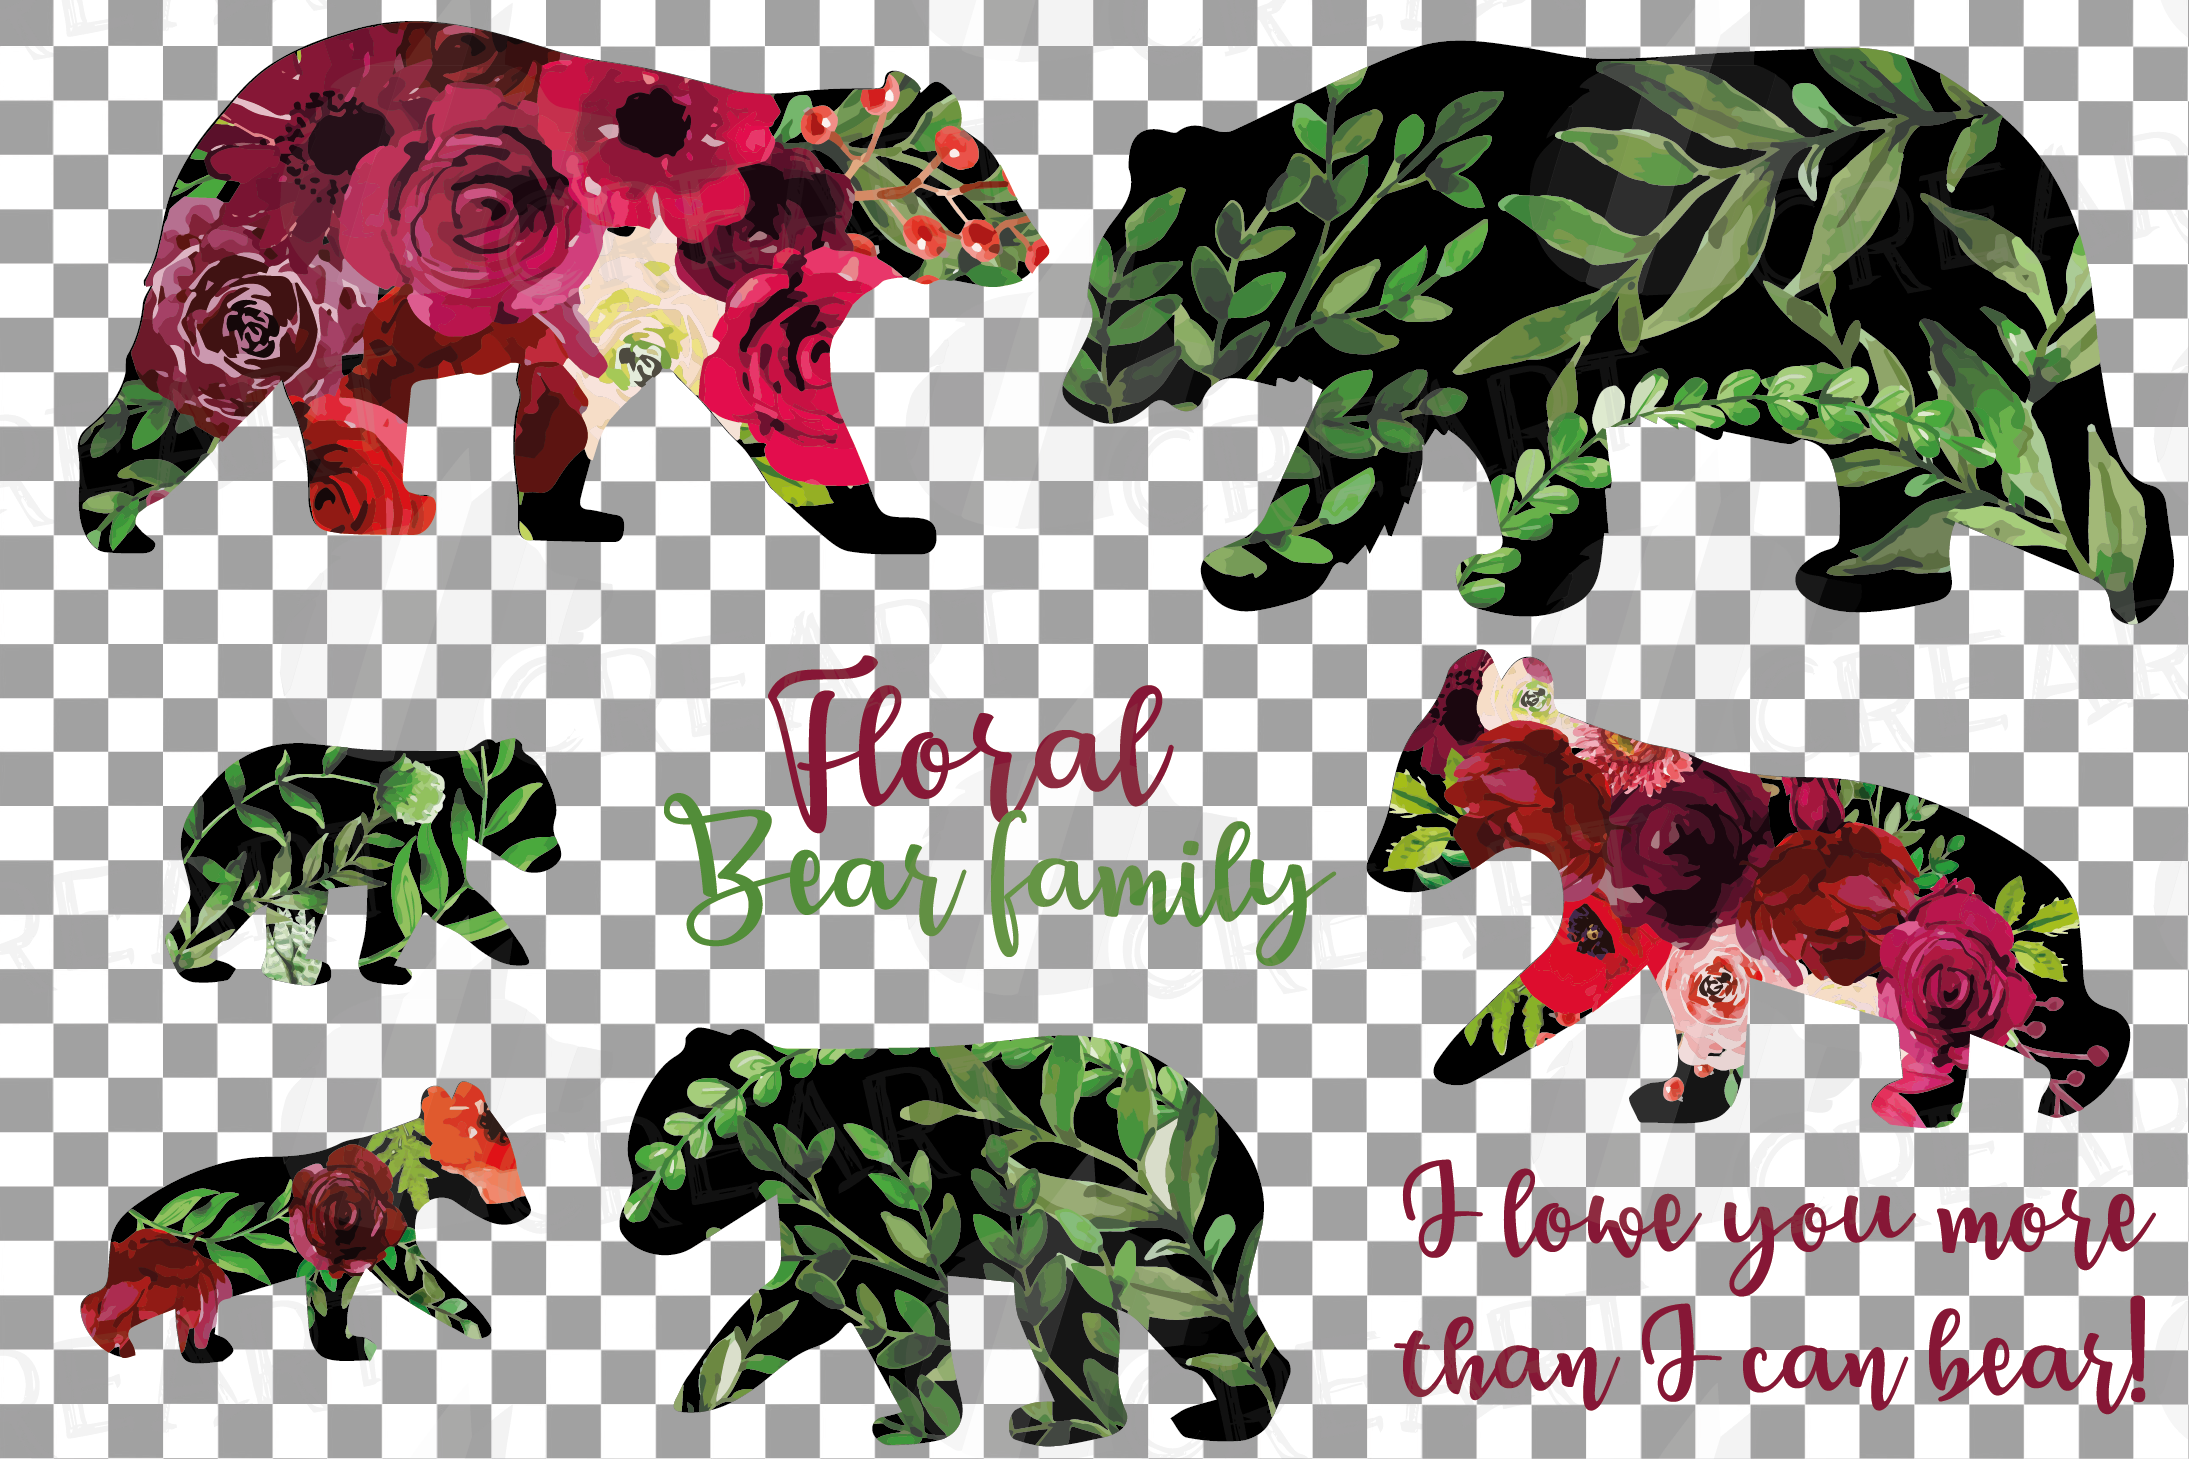 Floral bear family, sister, brother, baby, papa, mama bear example image 19